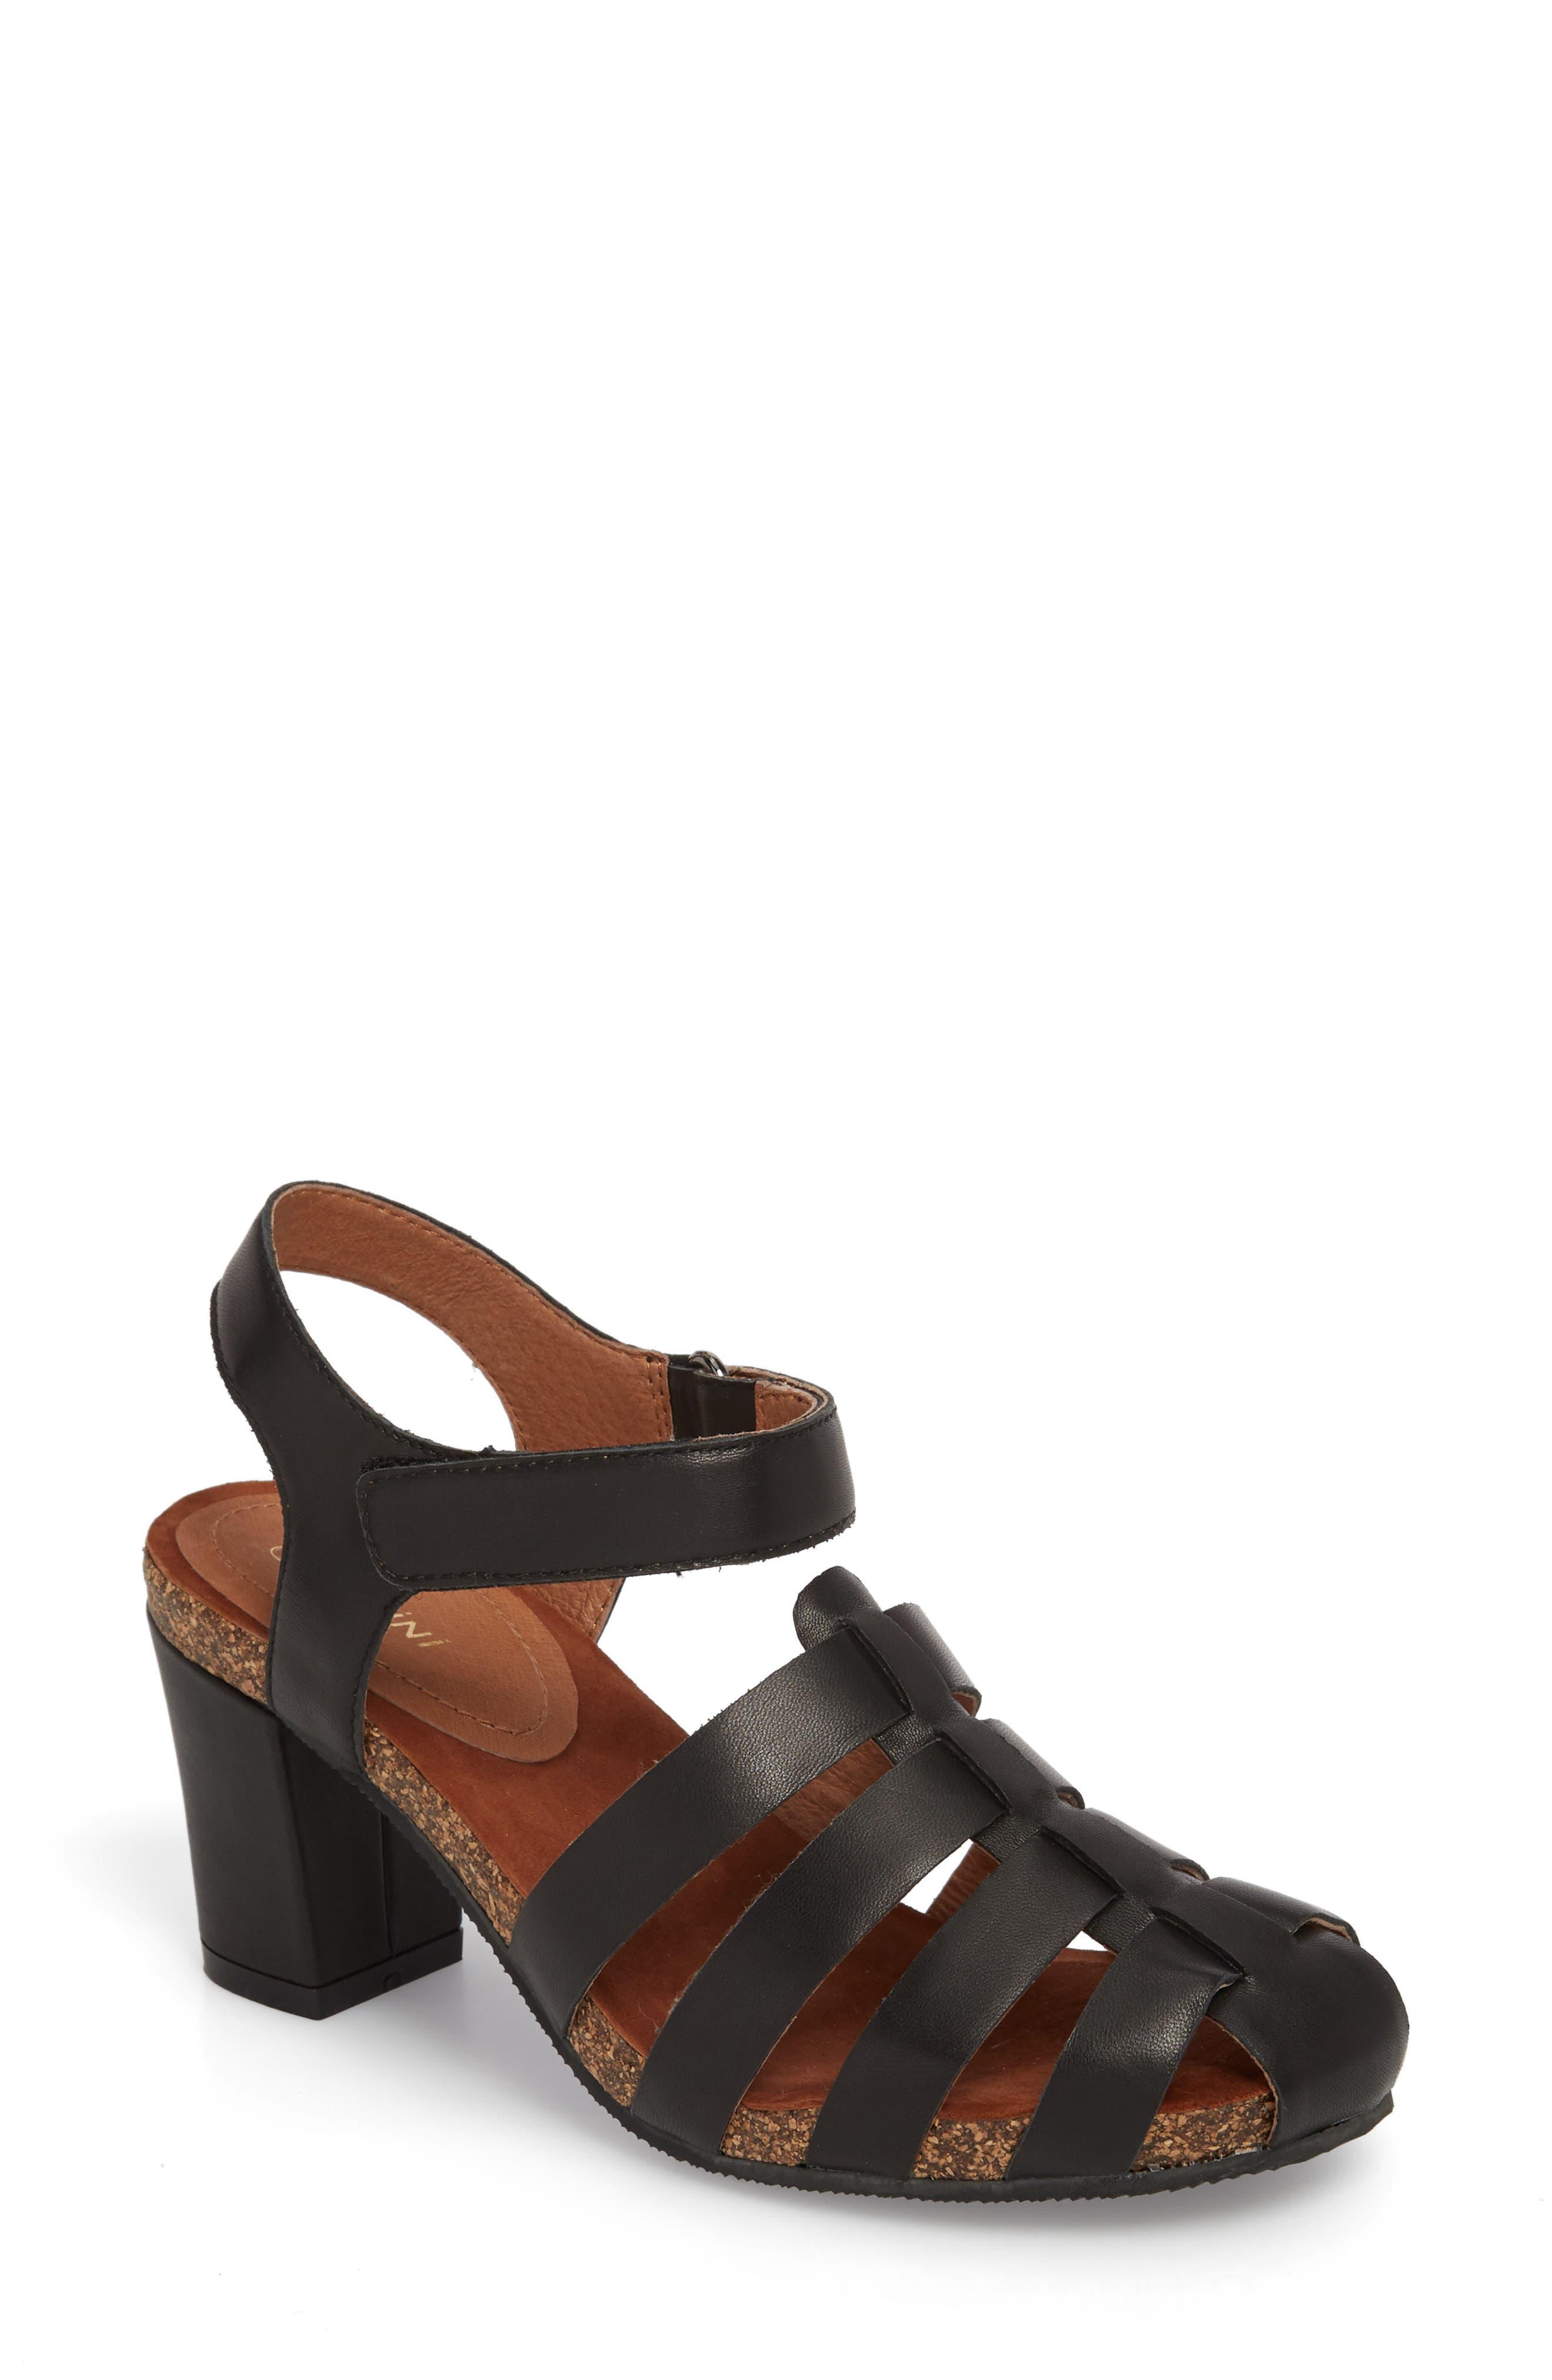 Carrara Block Heel Sandal,                             Main thumbnail 1, color,                             BLACK LEATHER